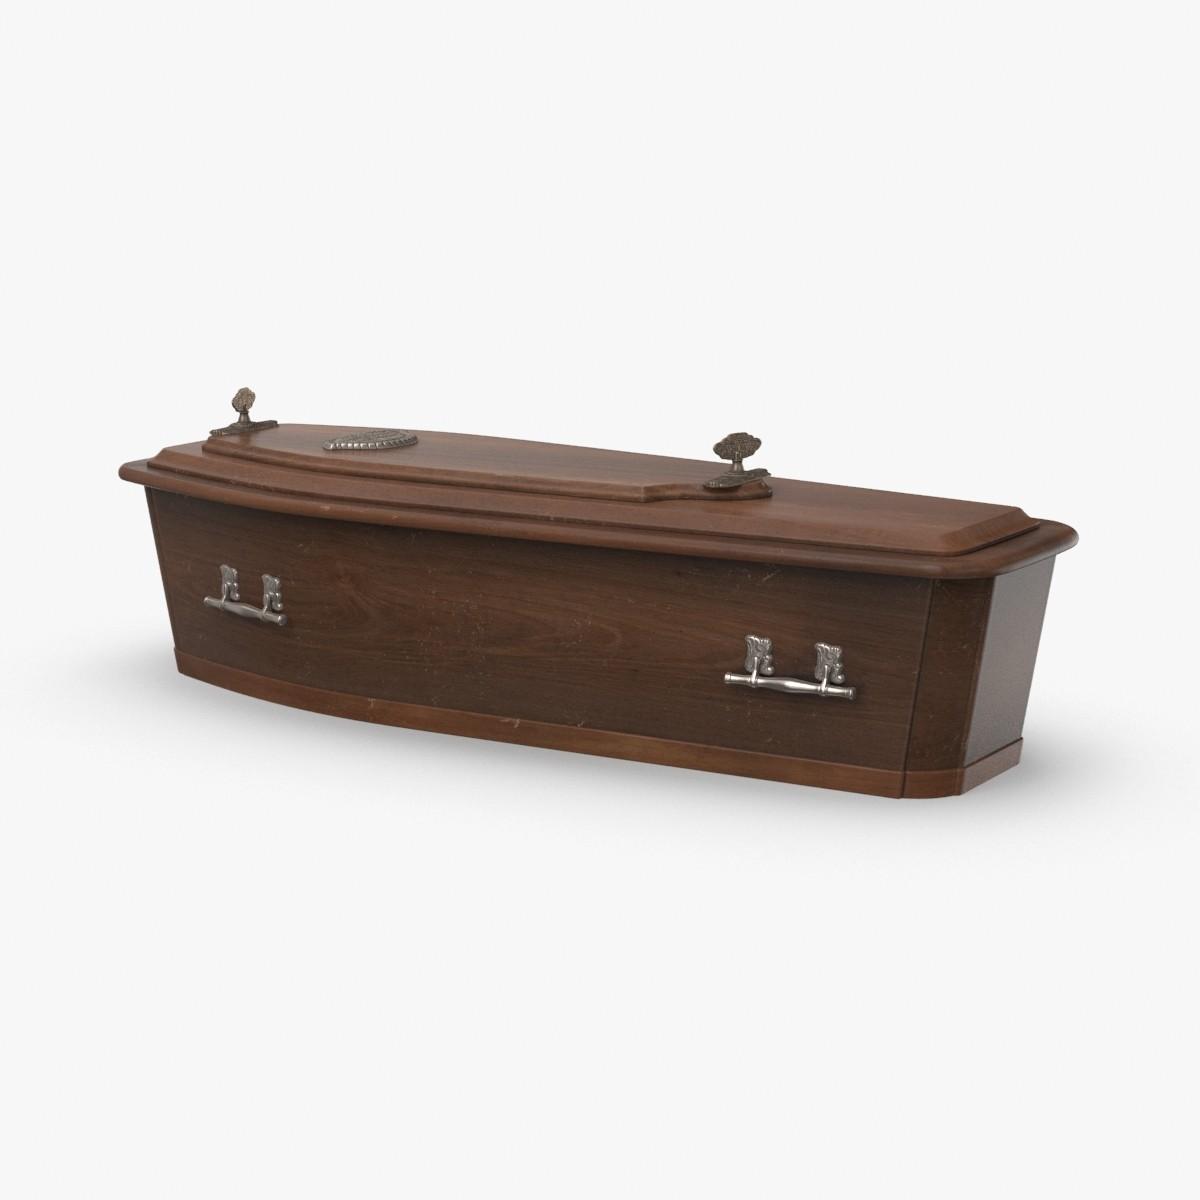 coffin-03 3D